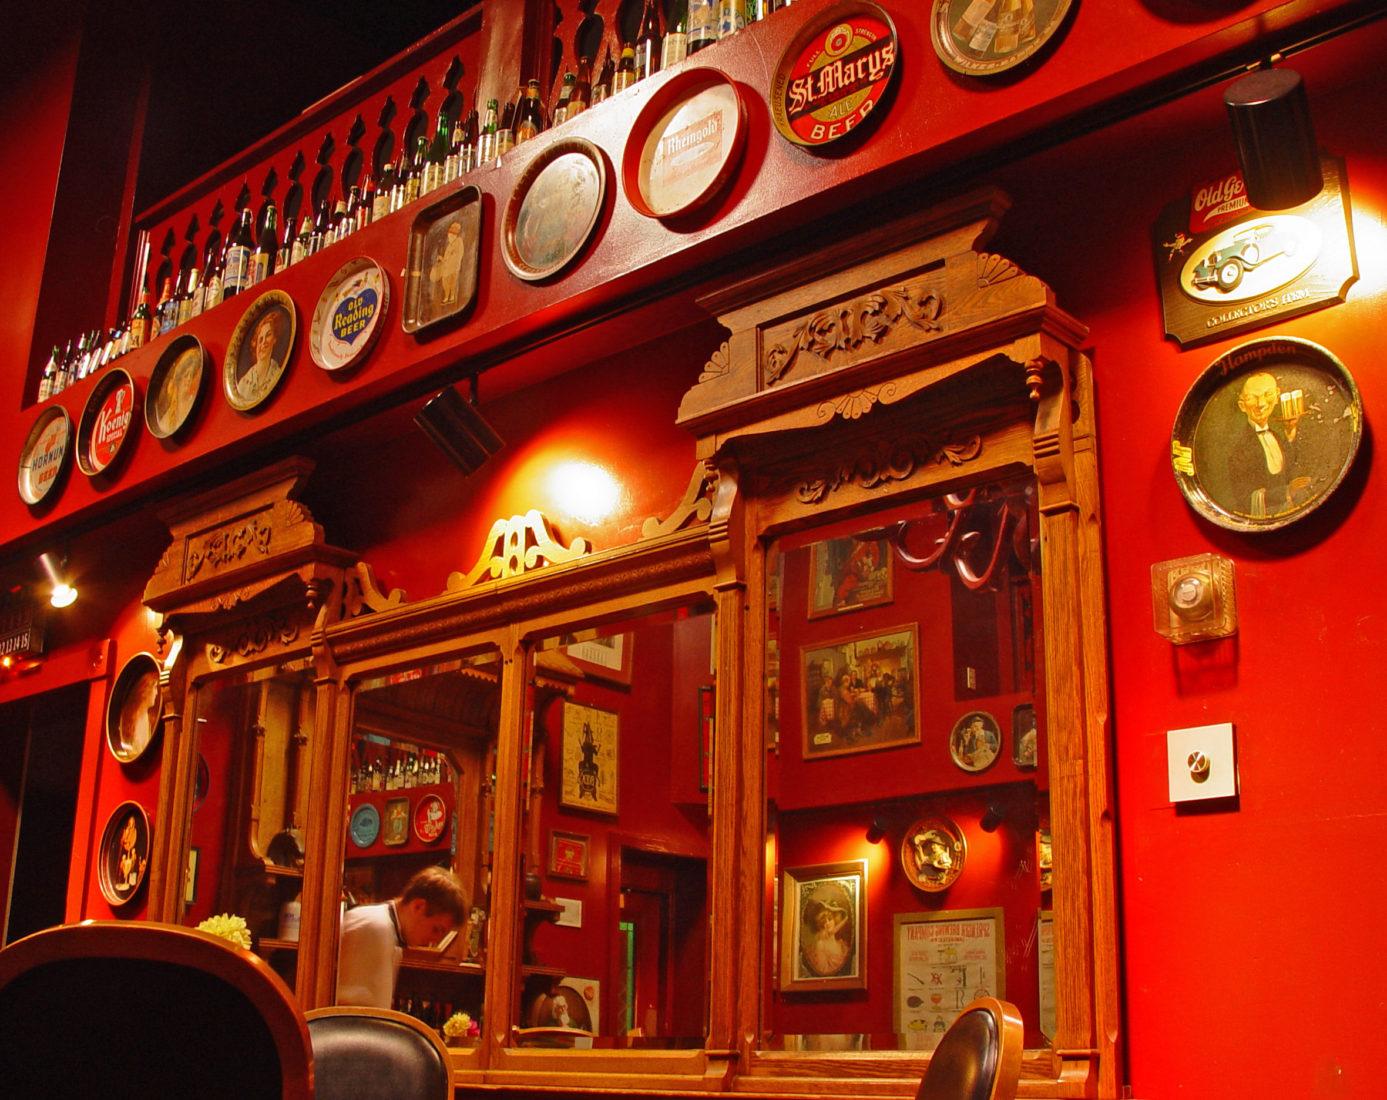 Stoudt's Brewery, Black Angus Restaurant, Adamstown PA